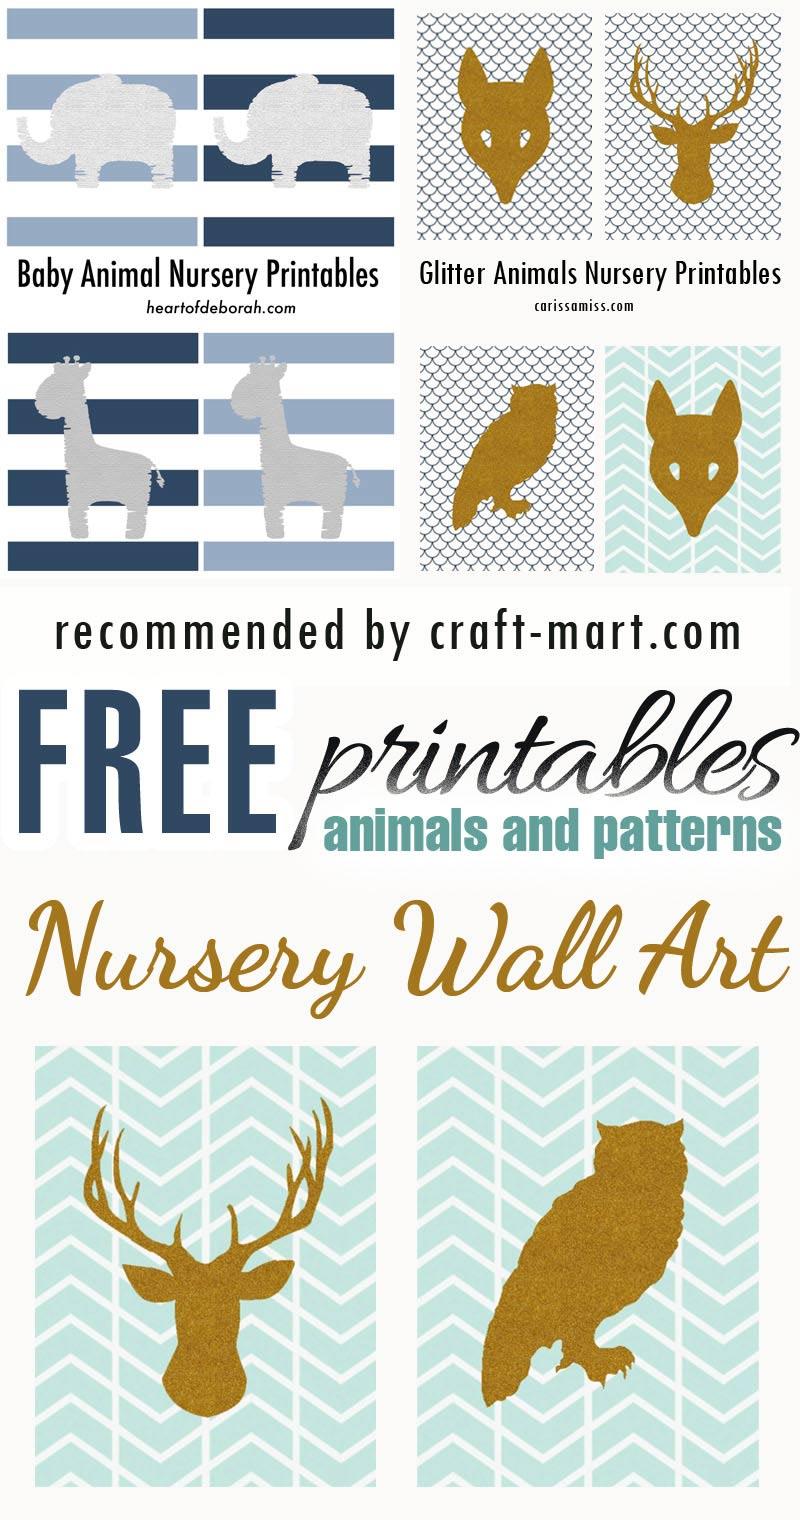 Patterns and Animals Modern Nursery FREE printables #freeprintables #freenurseryprints #freenurserywallart #cutenurseryprints #cuteanimalsfreeprintables #animalsfreenurseryprintables